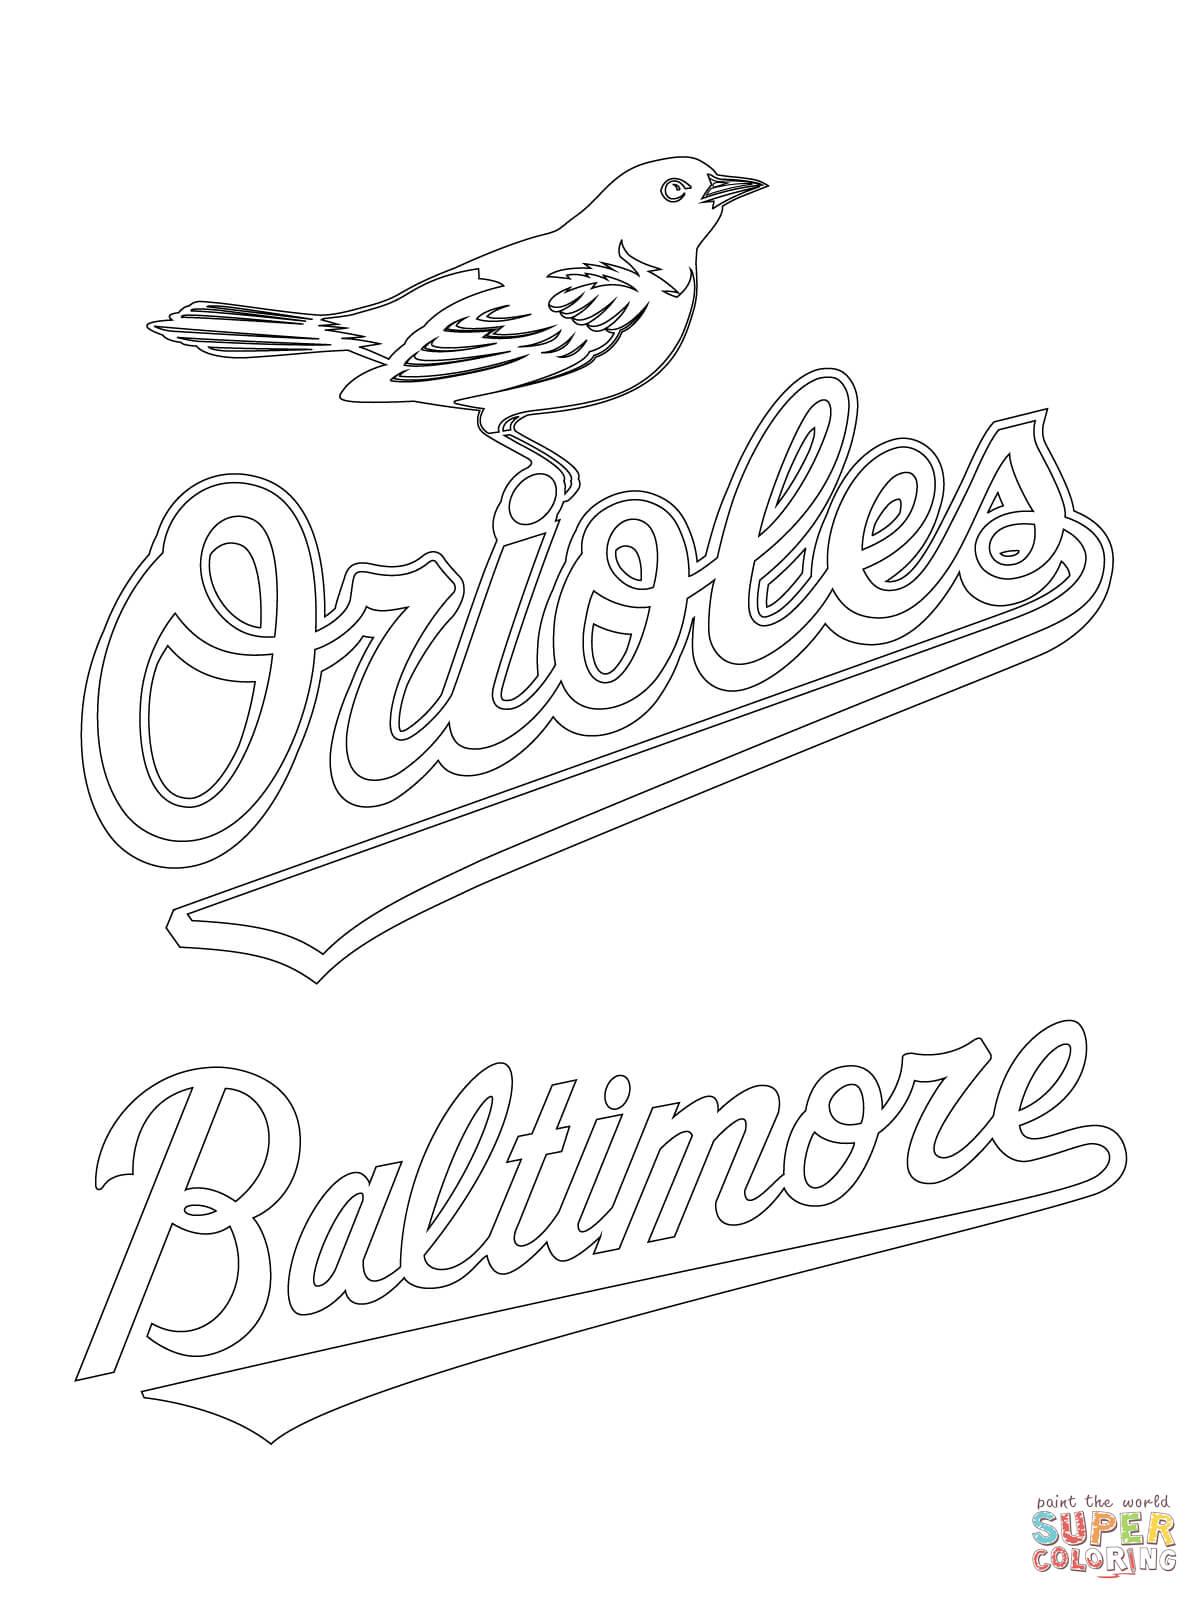 Diamondbacks Logo Coloring Page Coloring - Worksheet & Coloring Pages